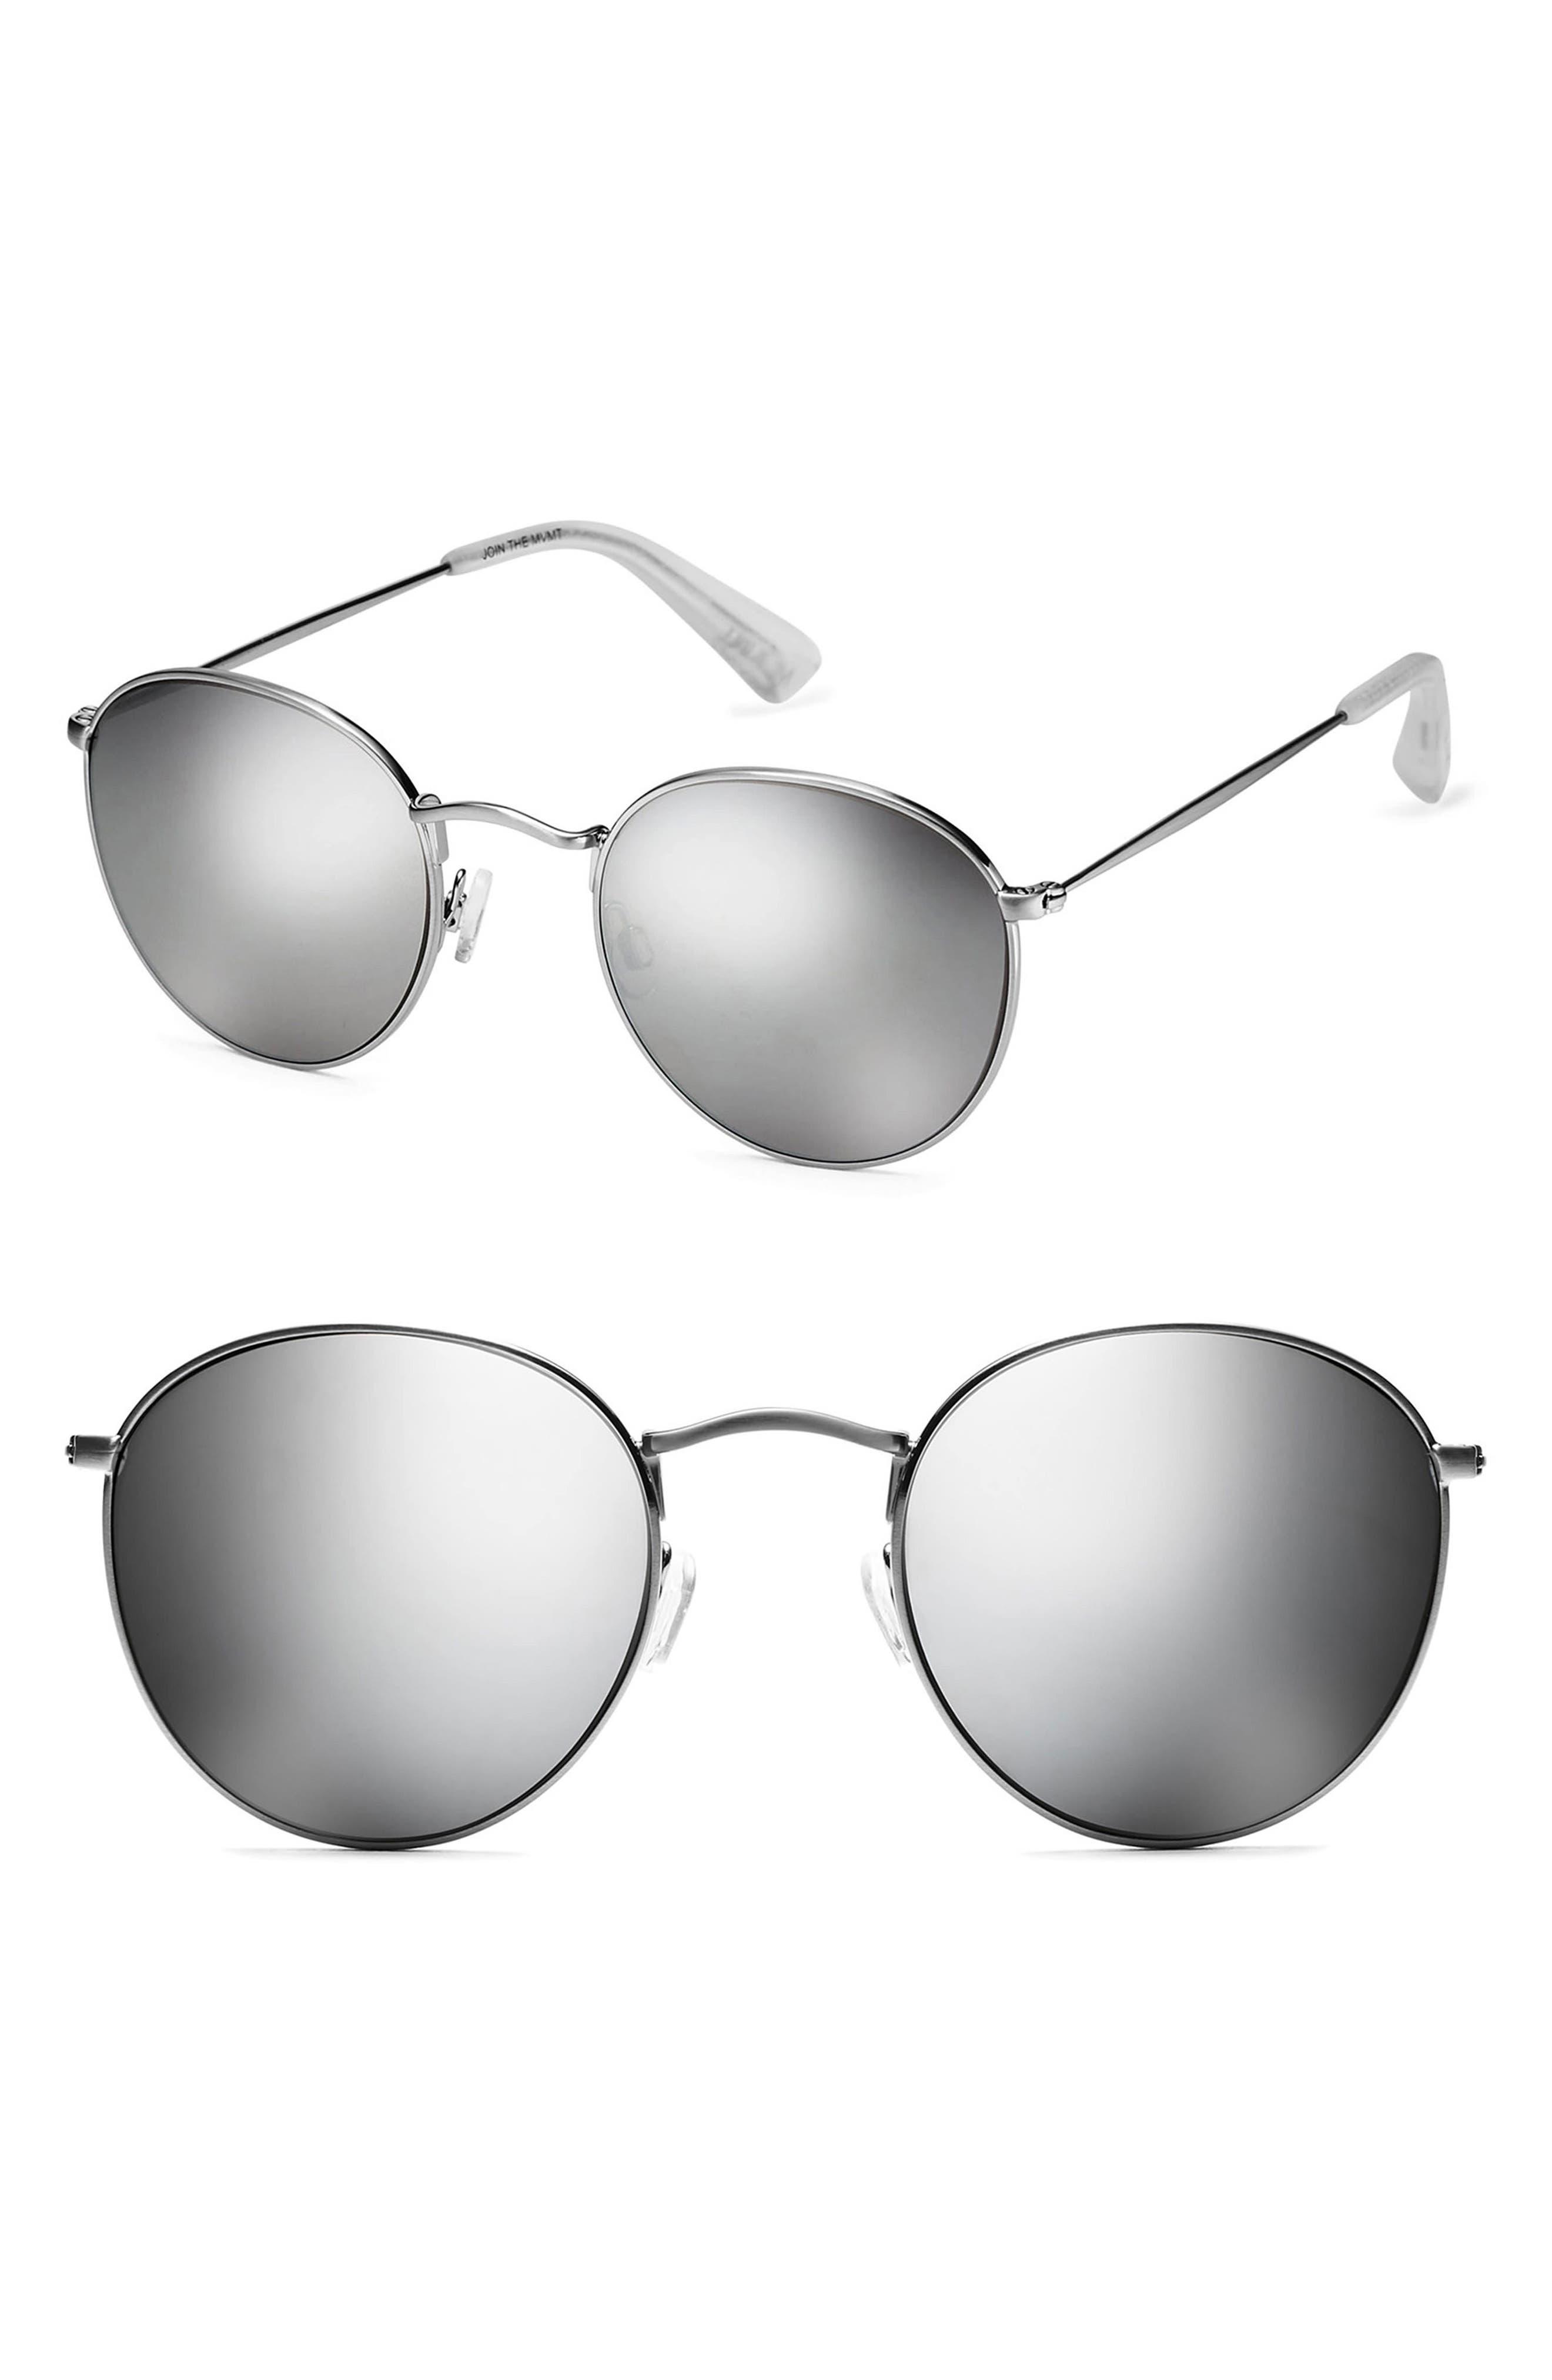 Icon 50mm Wire Sunglasses,                             Main thumbnail 1, color,                             SILVER MIRROR